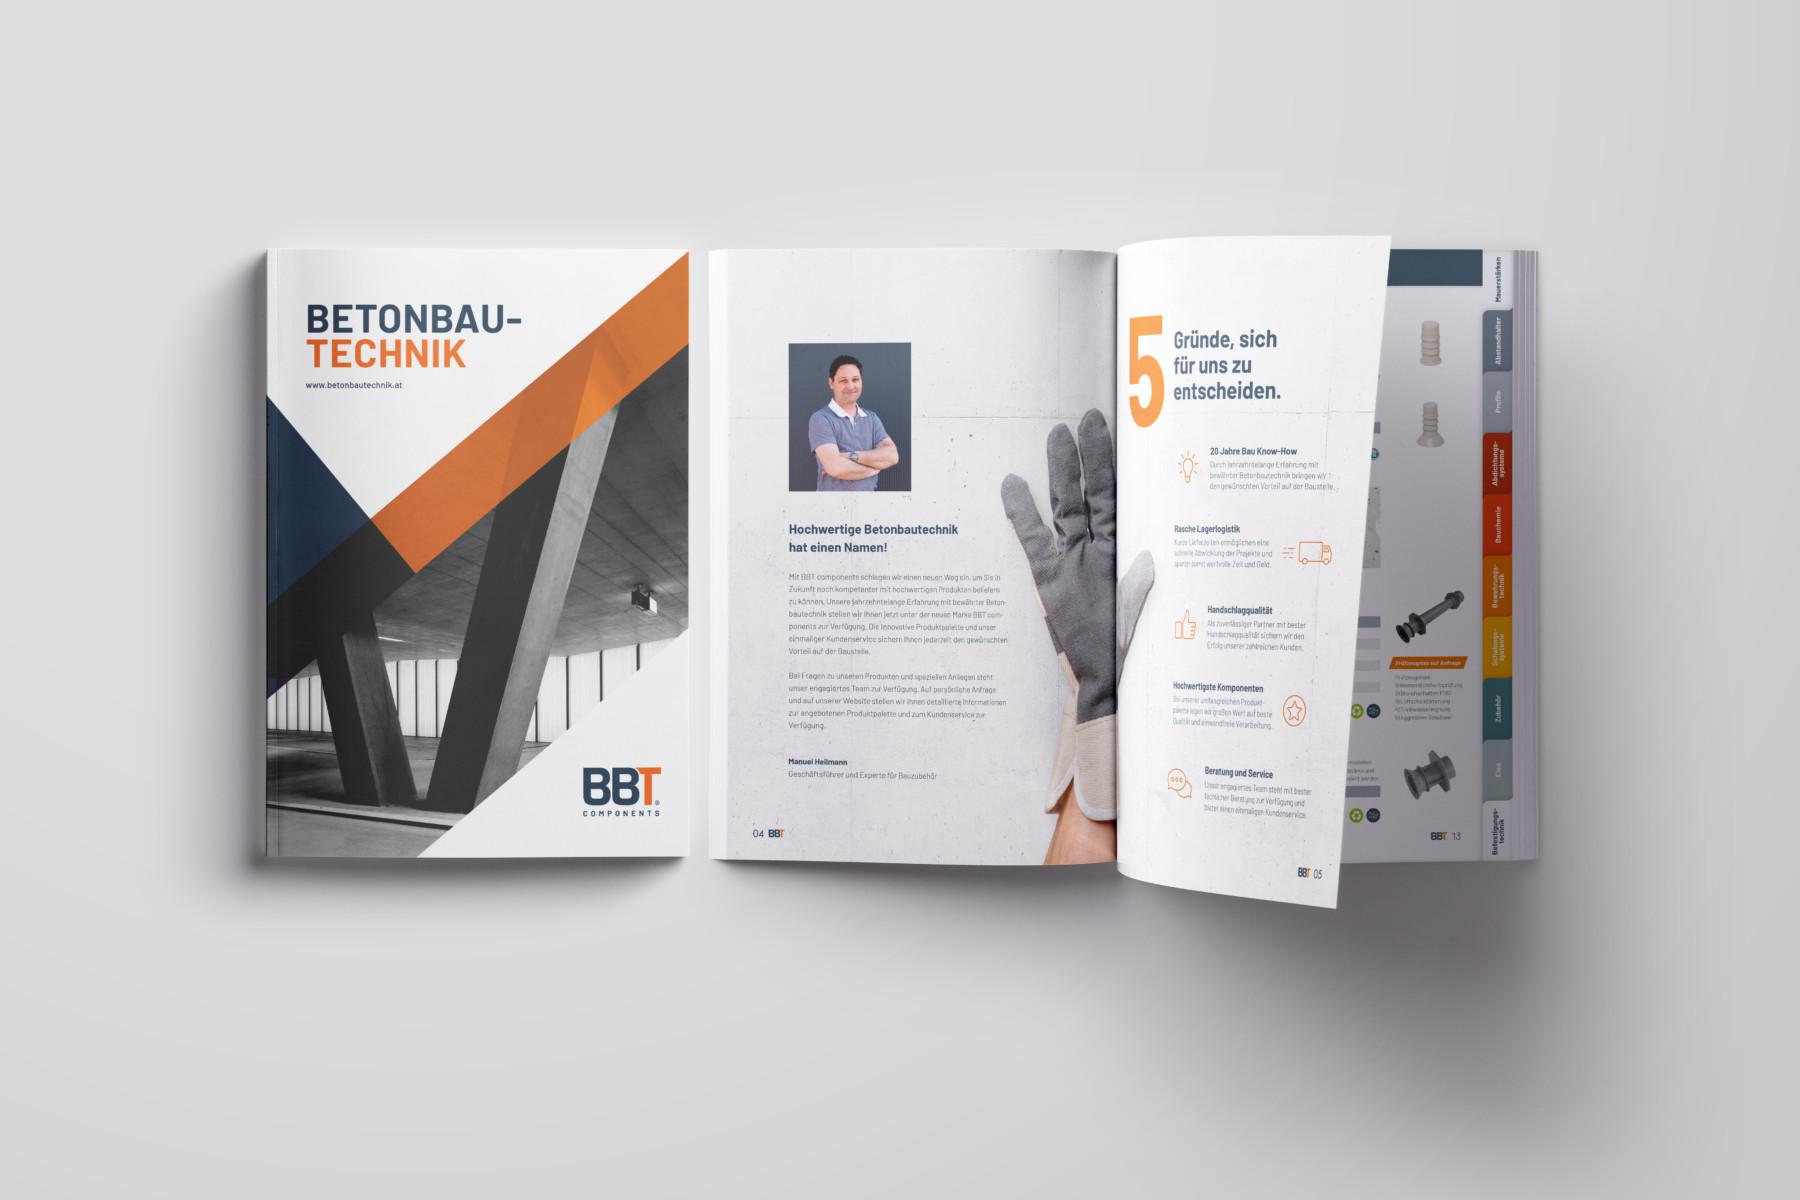 katalog-betonbautechnik-b2-werbeagentur